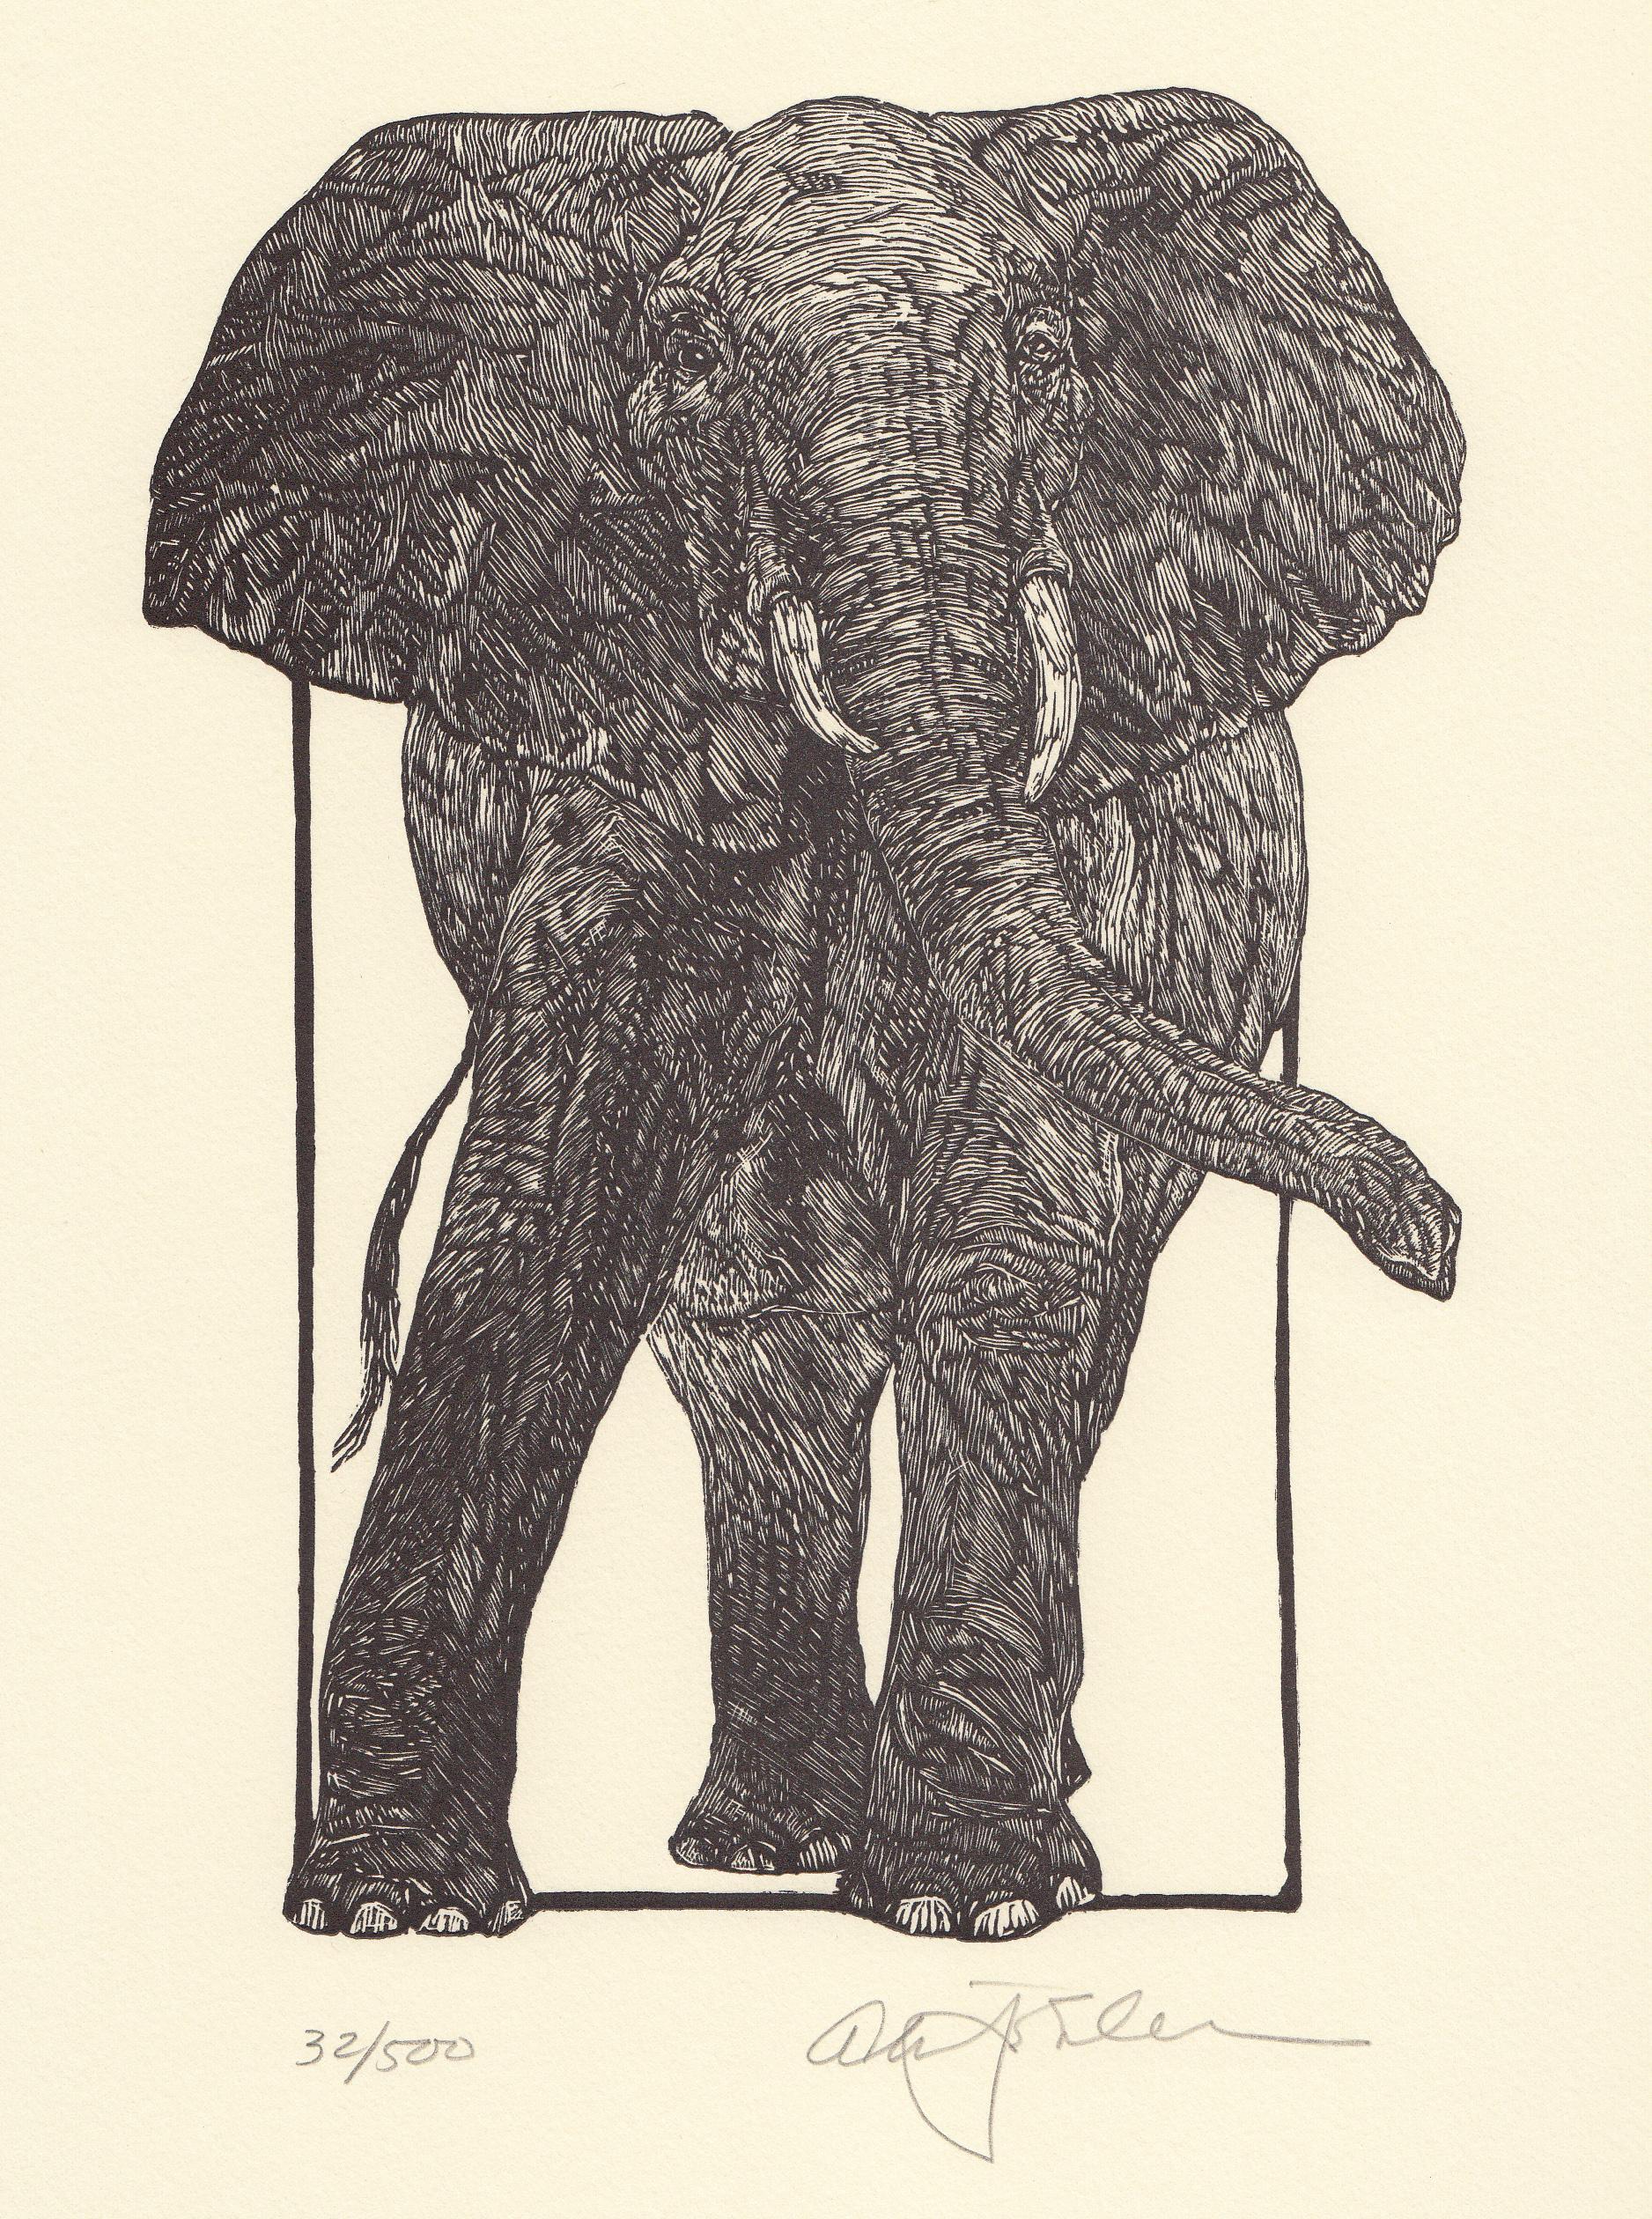 Elephant ∙ Engravings ∙ R Michelson Galleries